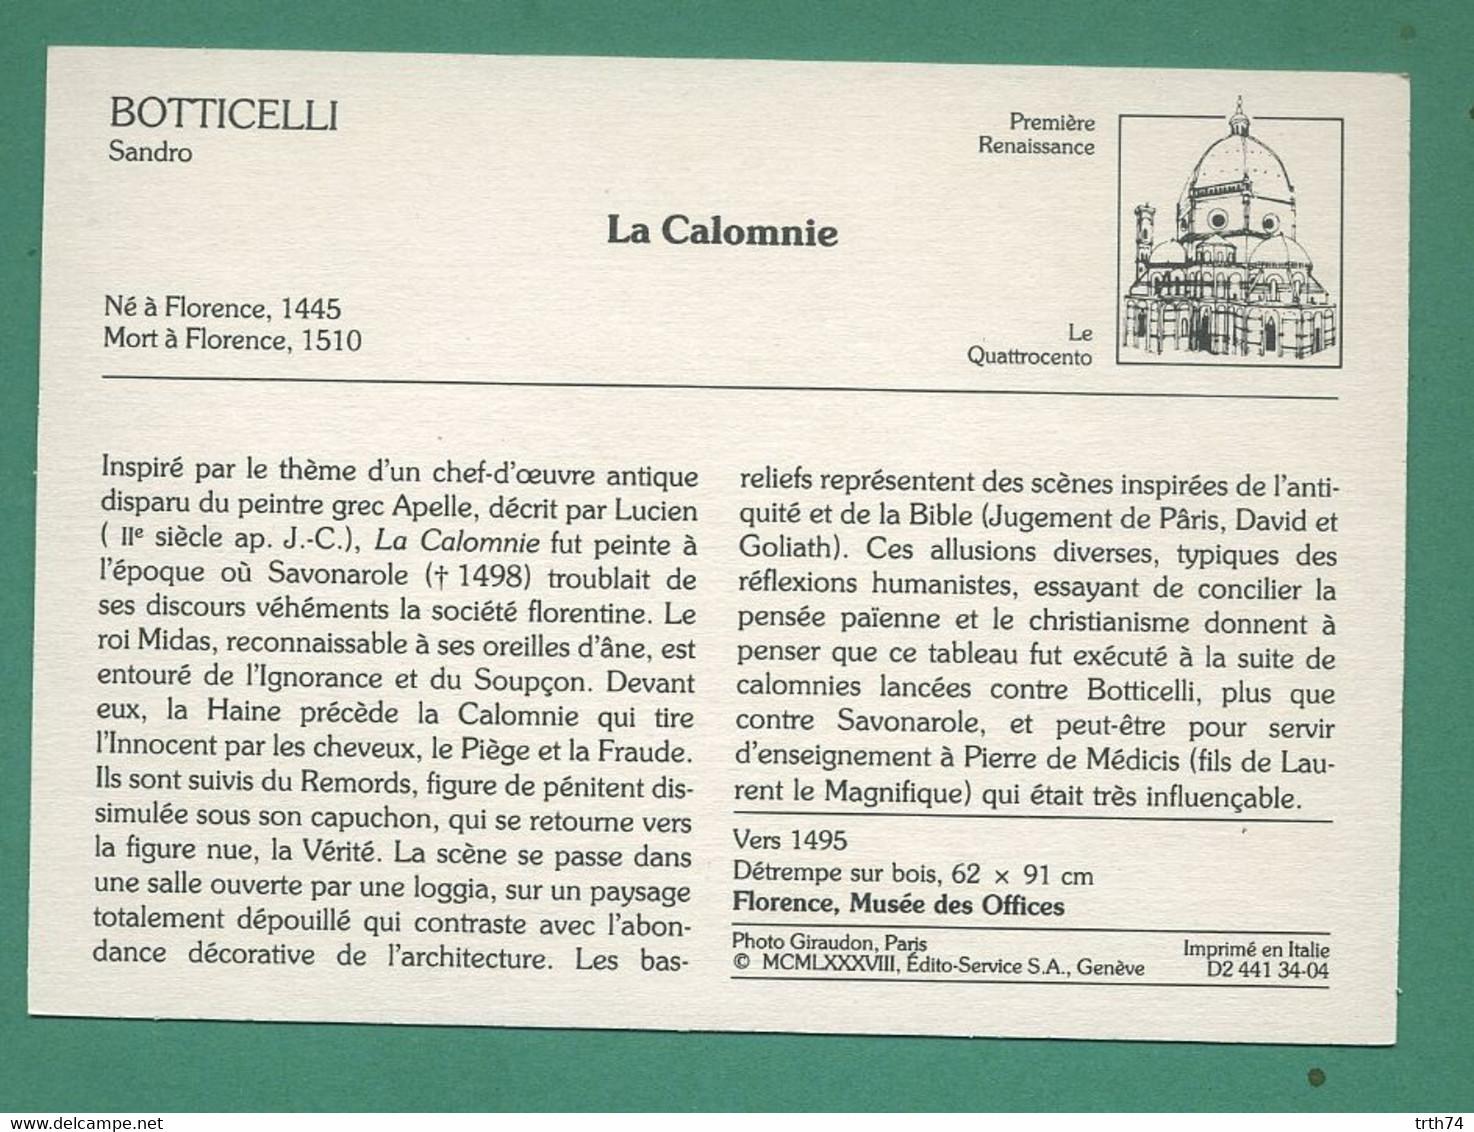 Botticelli Sandro La Calomnie ( Décoration Coquillage, Shell ) - Unclassified